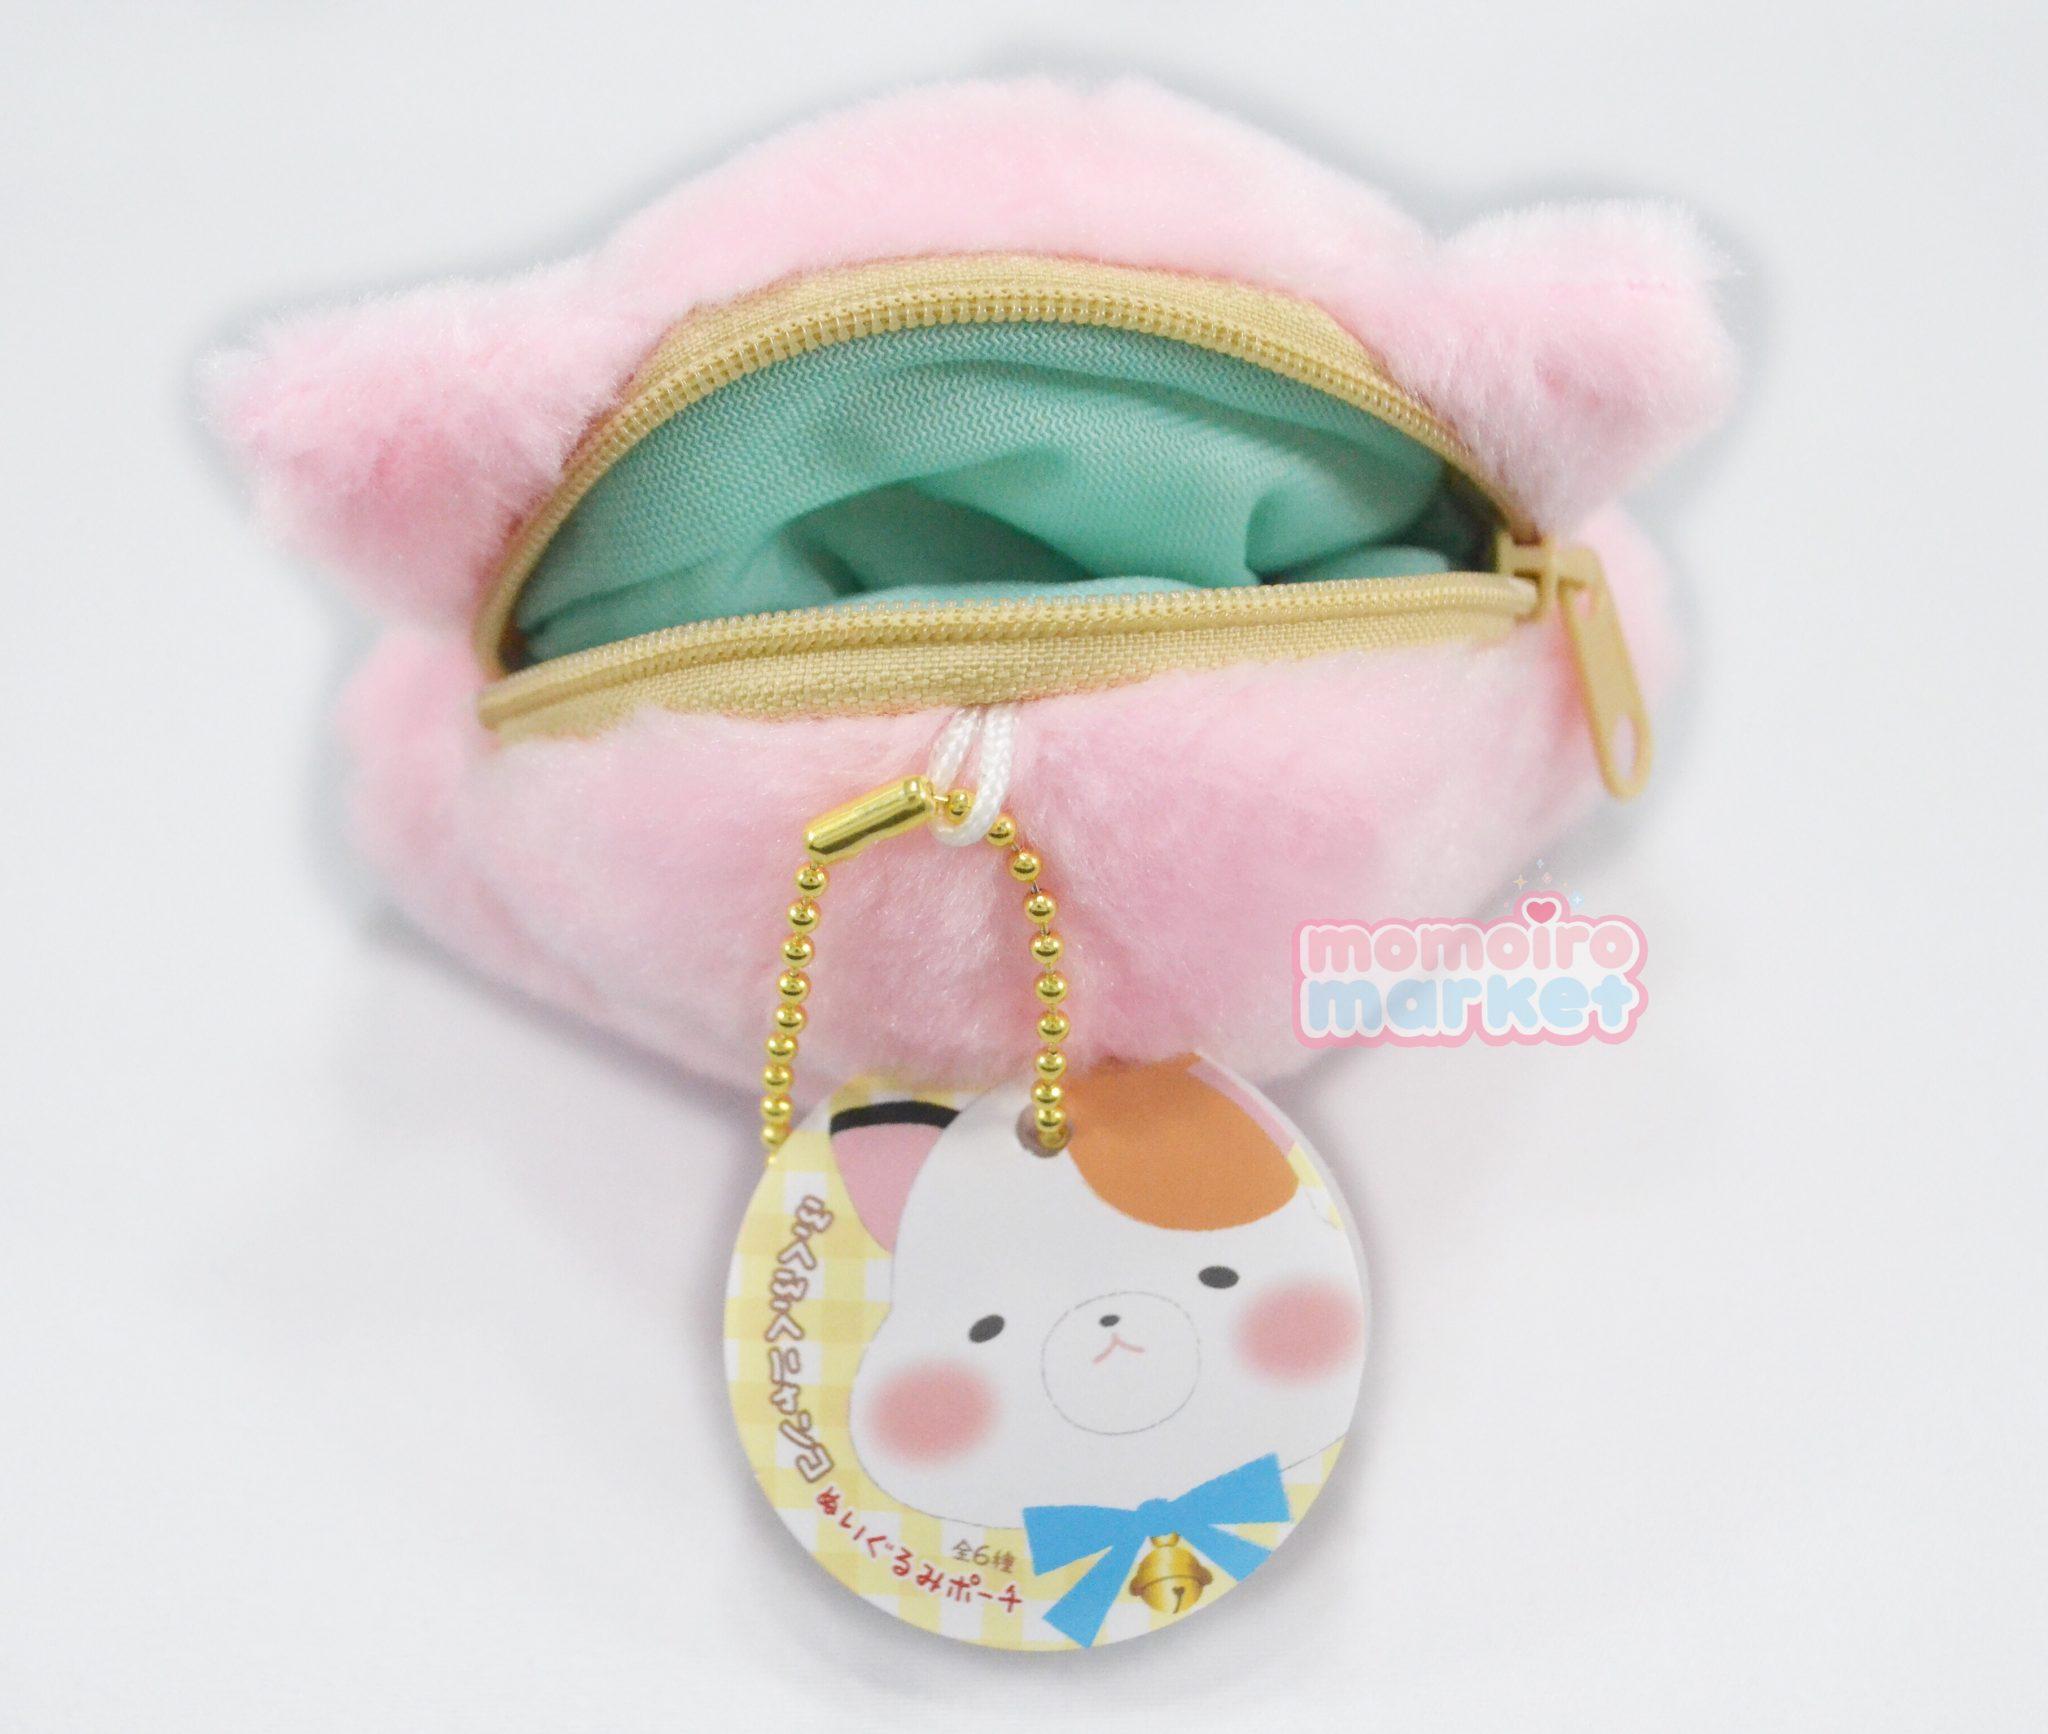 Pink cat coin pouch purse kawaii plush momoiro market japan import